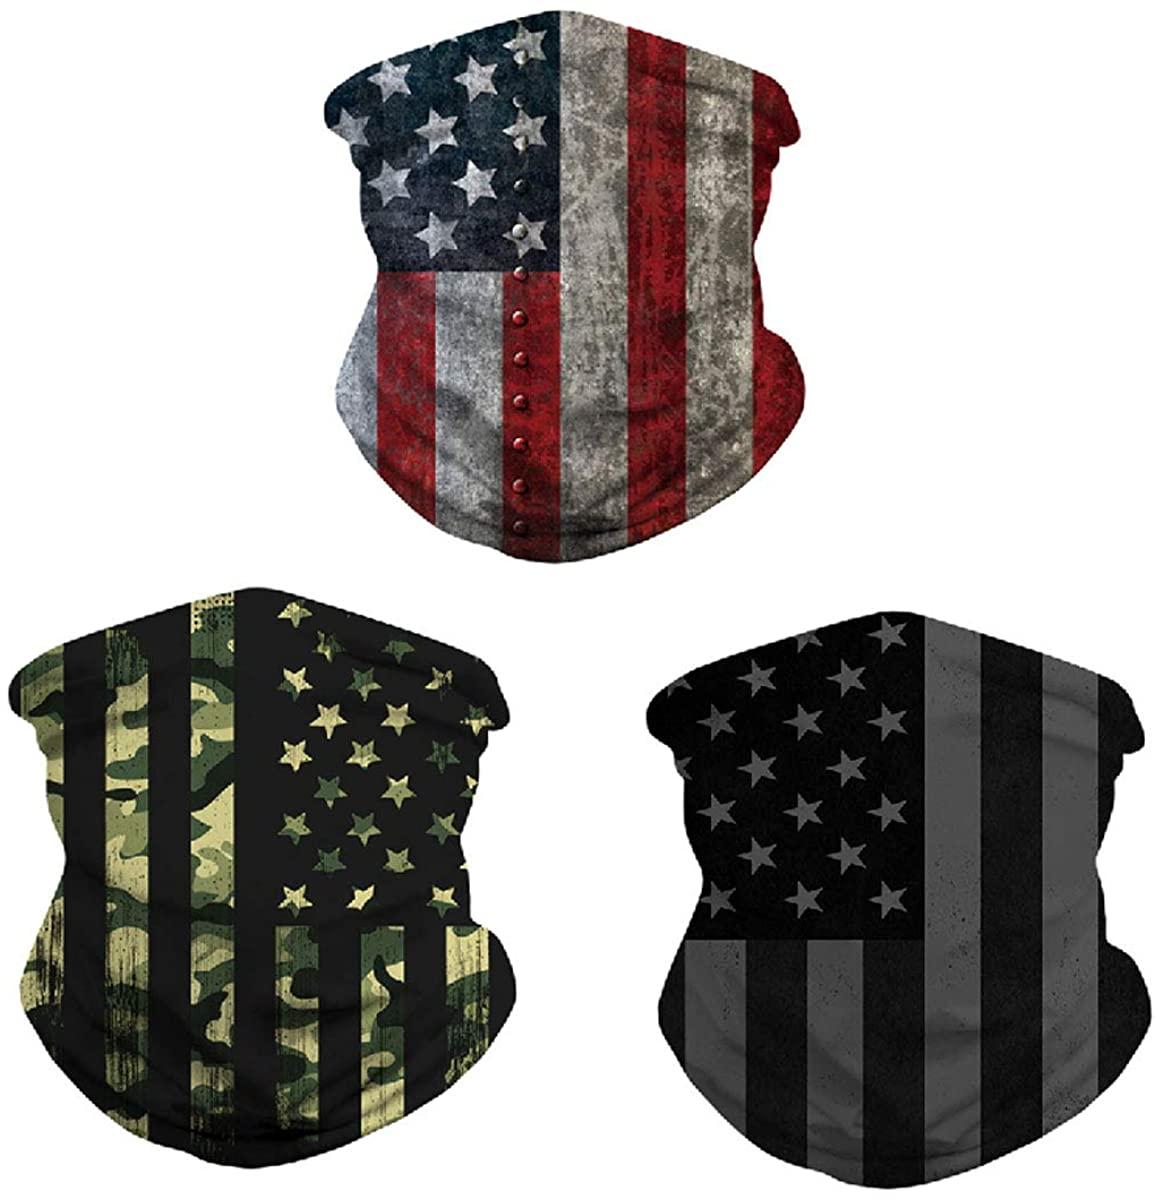 Neck Gaiter,3 Pcs American Flag Breathable Neck Bandana Motorcycle Face Covers for Women Men